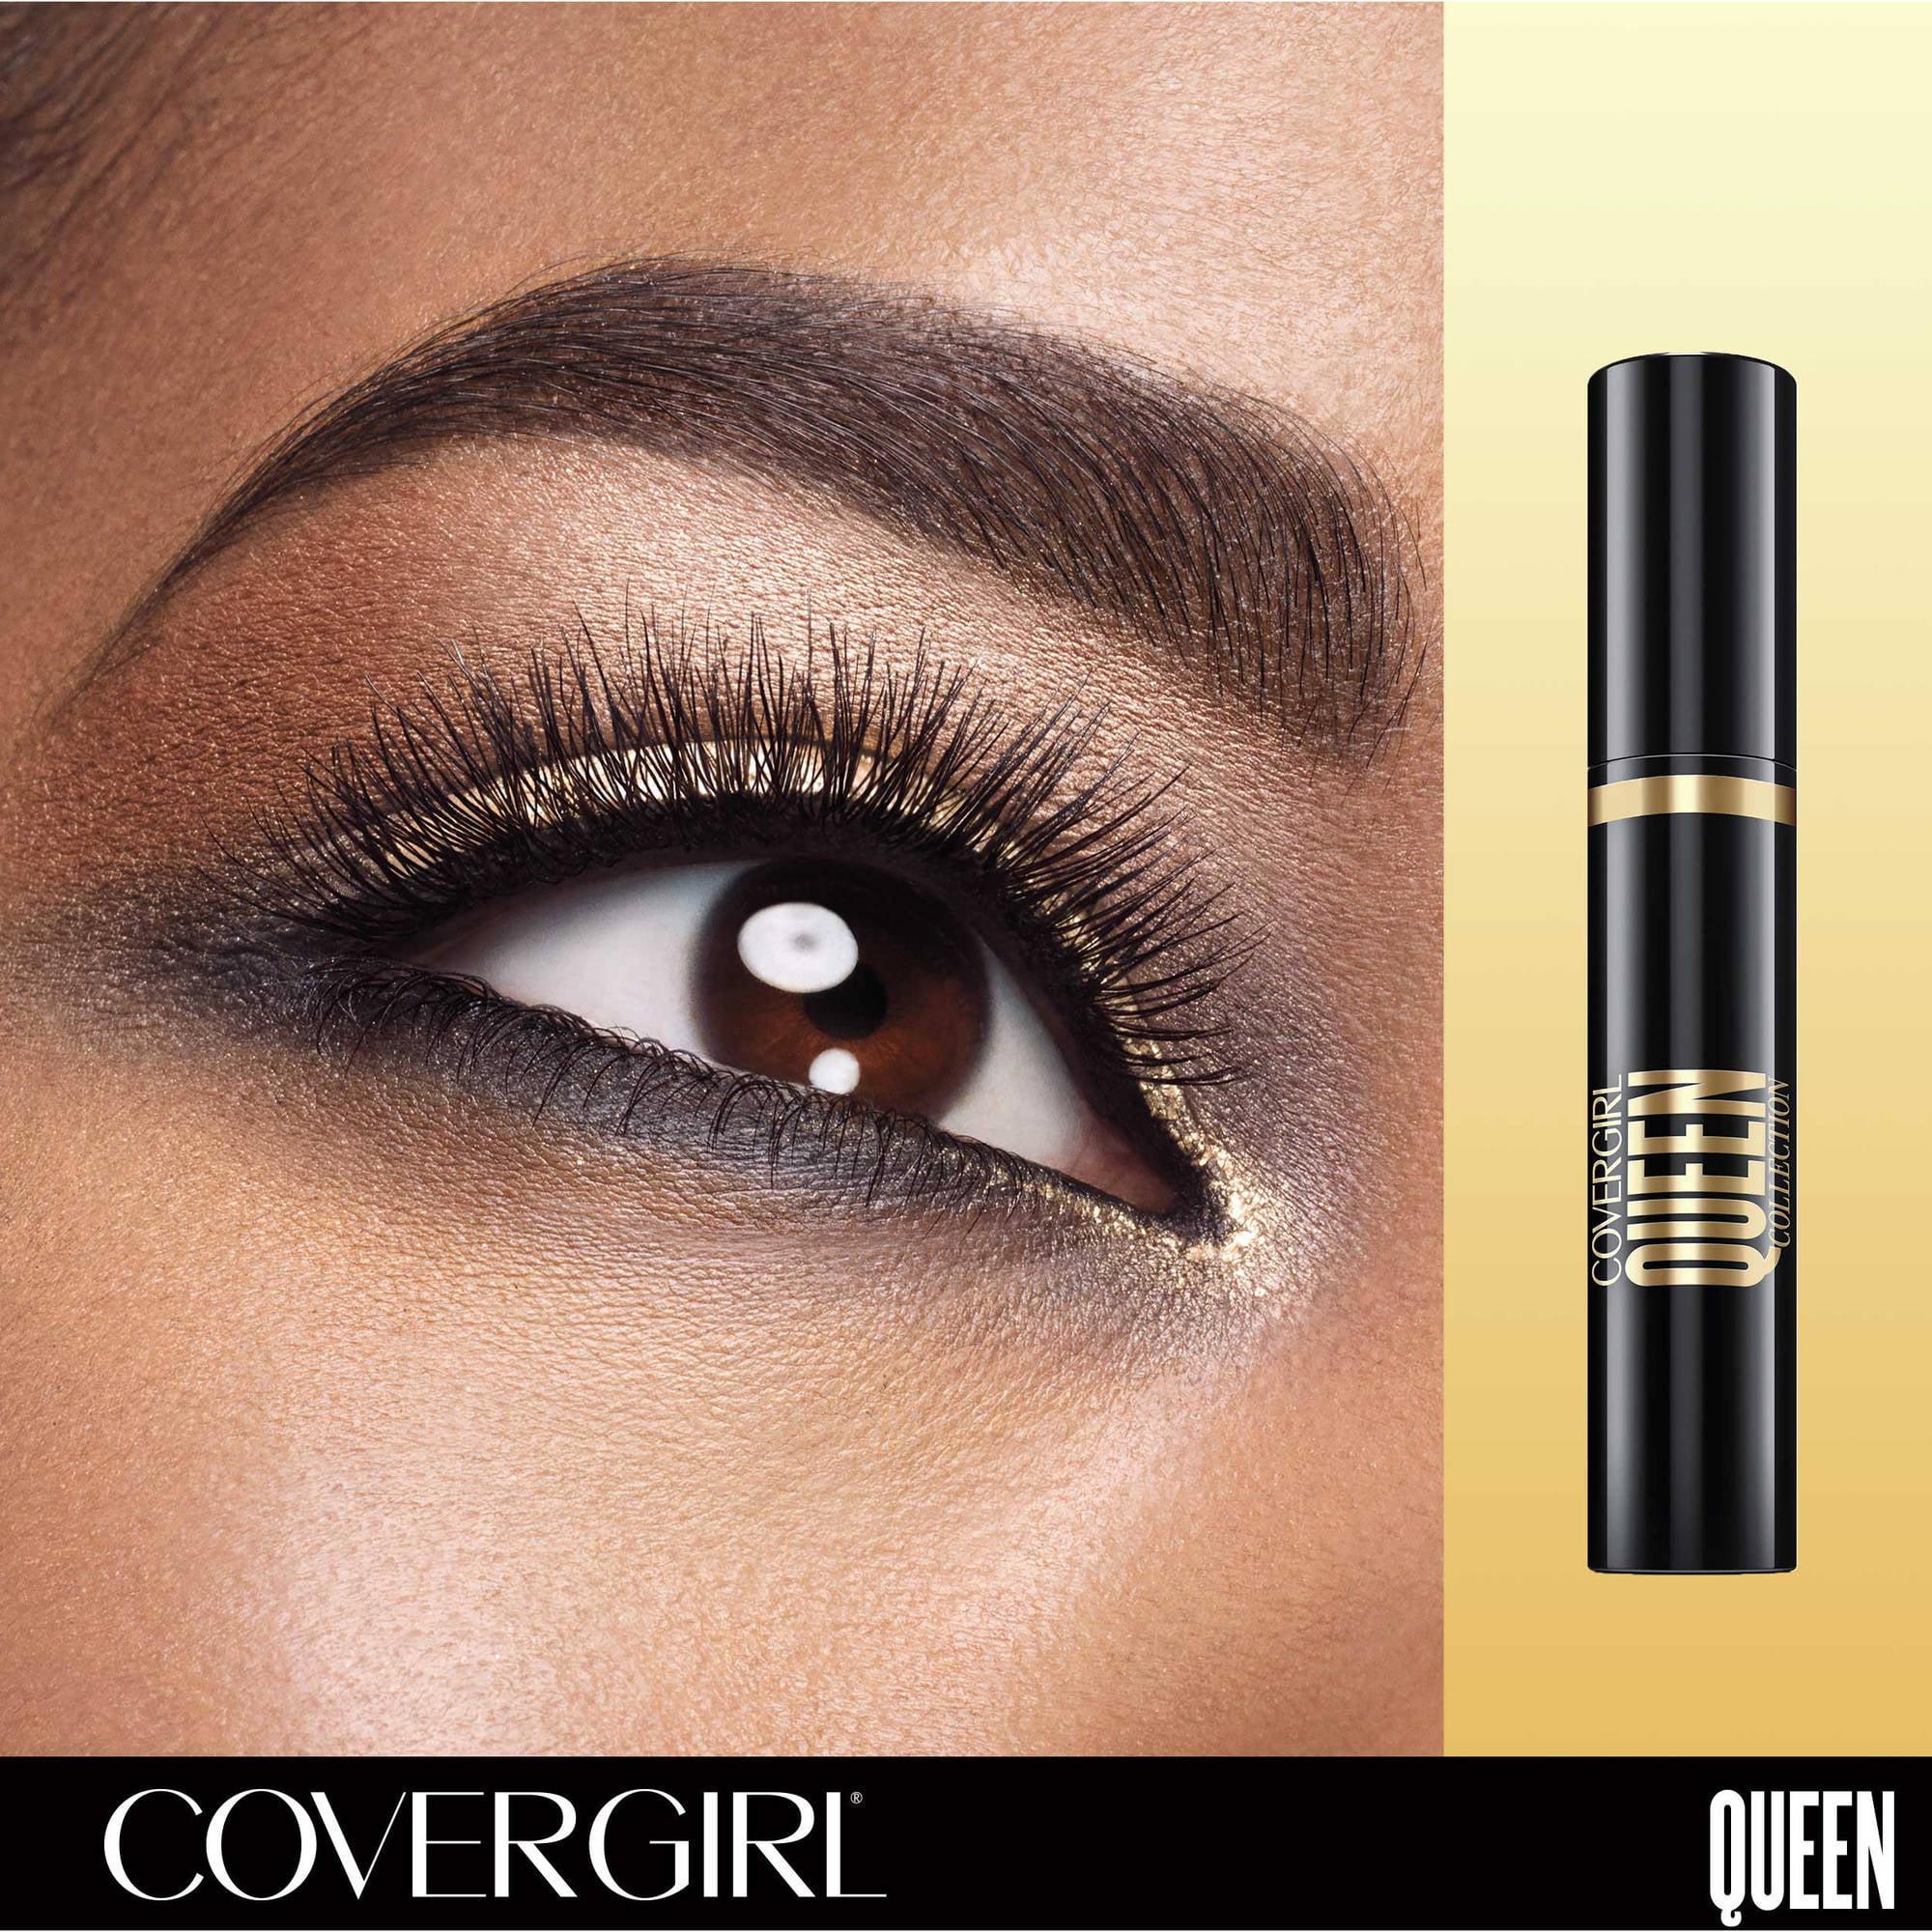 8d5562e530c COVERGIRL Queen Collection False Lash Drama Mascara, Very Black, .4 fl oz -  Walmart.com